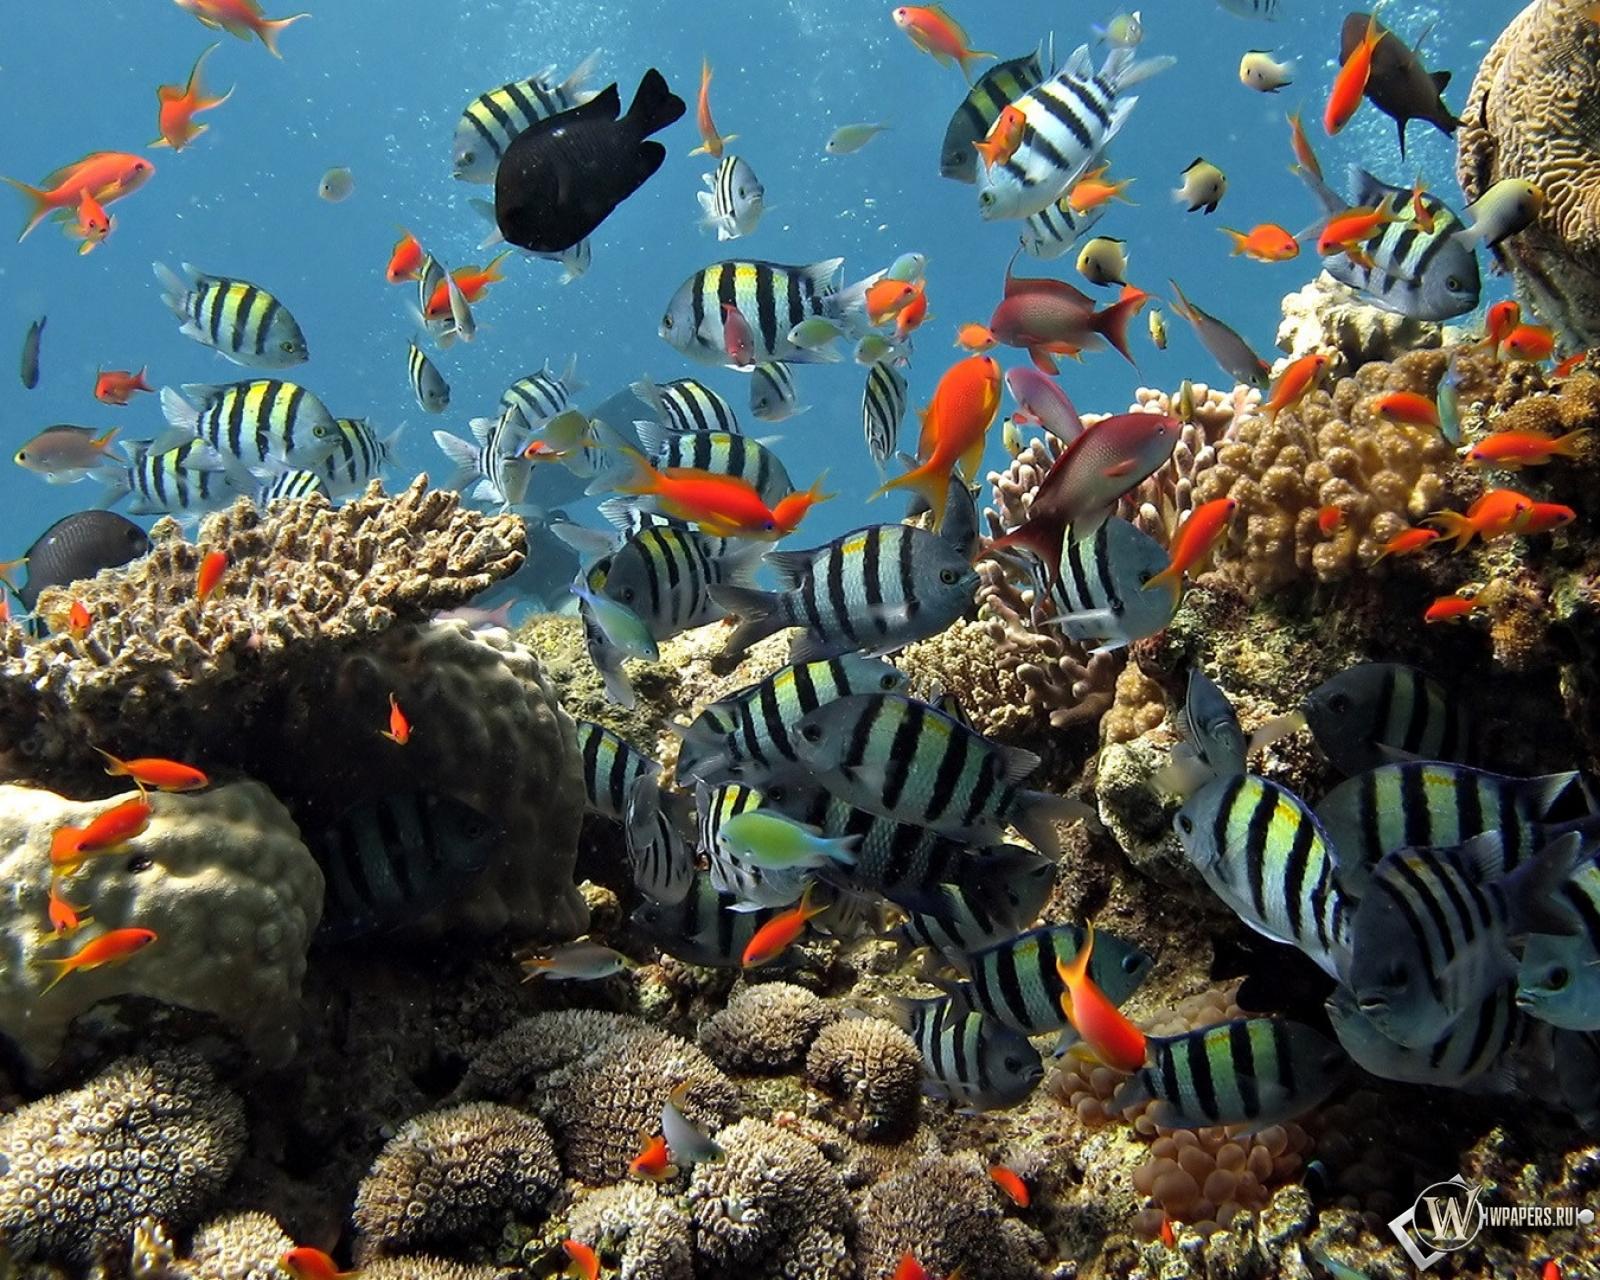 Подводный мир шарм эль шейха 1600x1280